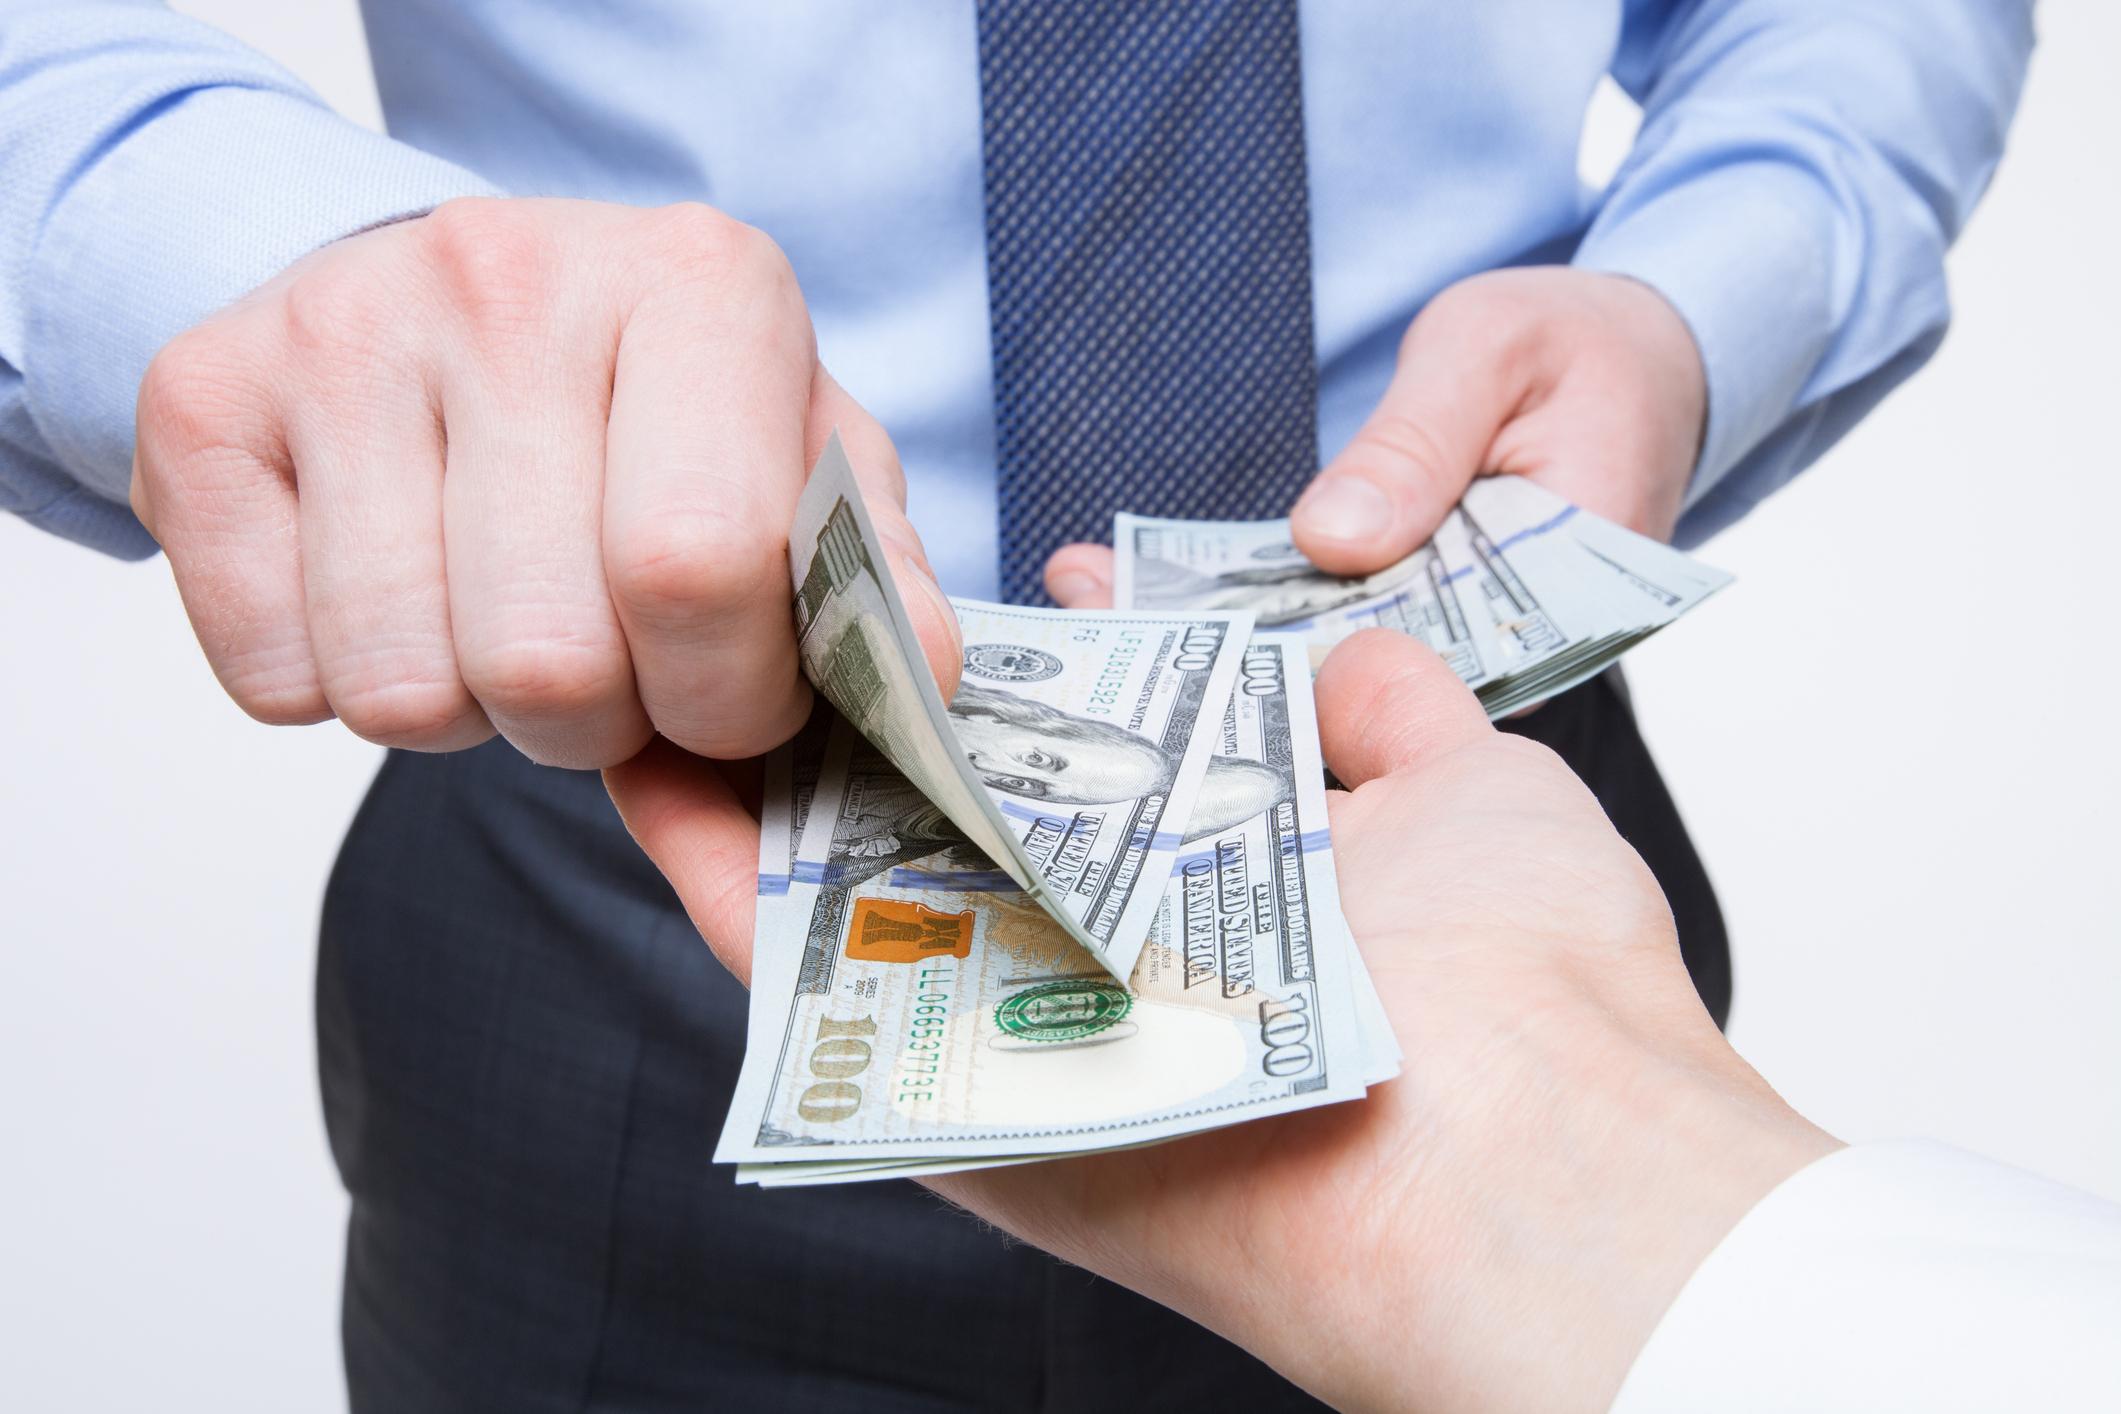 A man handing someone $100 bills.